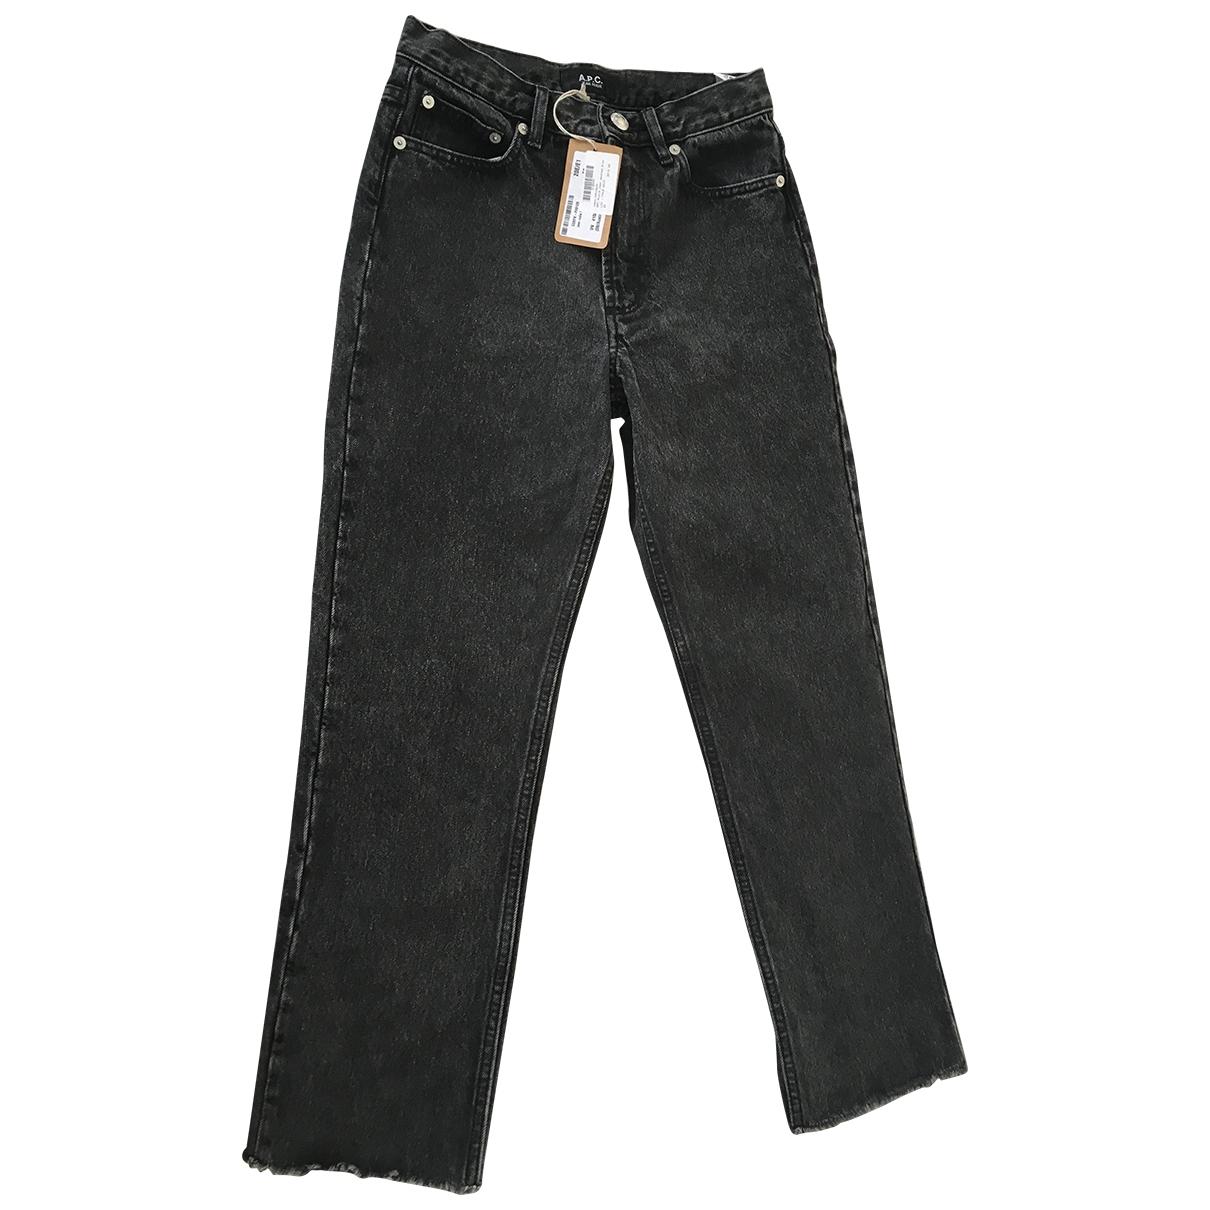 Apc \N Grey Denim - Jeans Jeans for Women 25 US